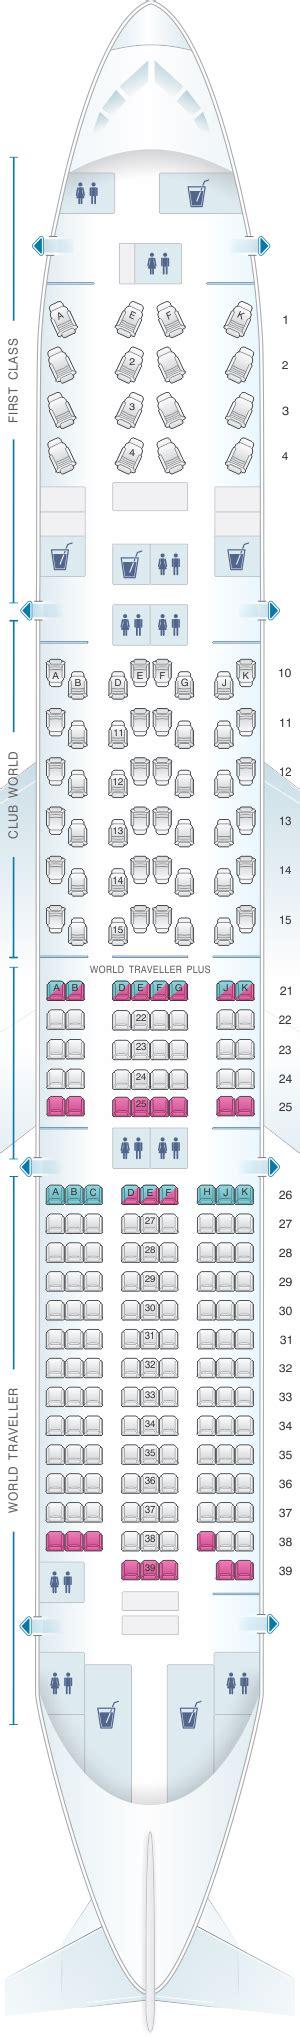 ba 777 seat map seat map airways boeing b777 200 four class